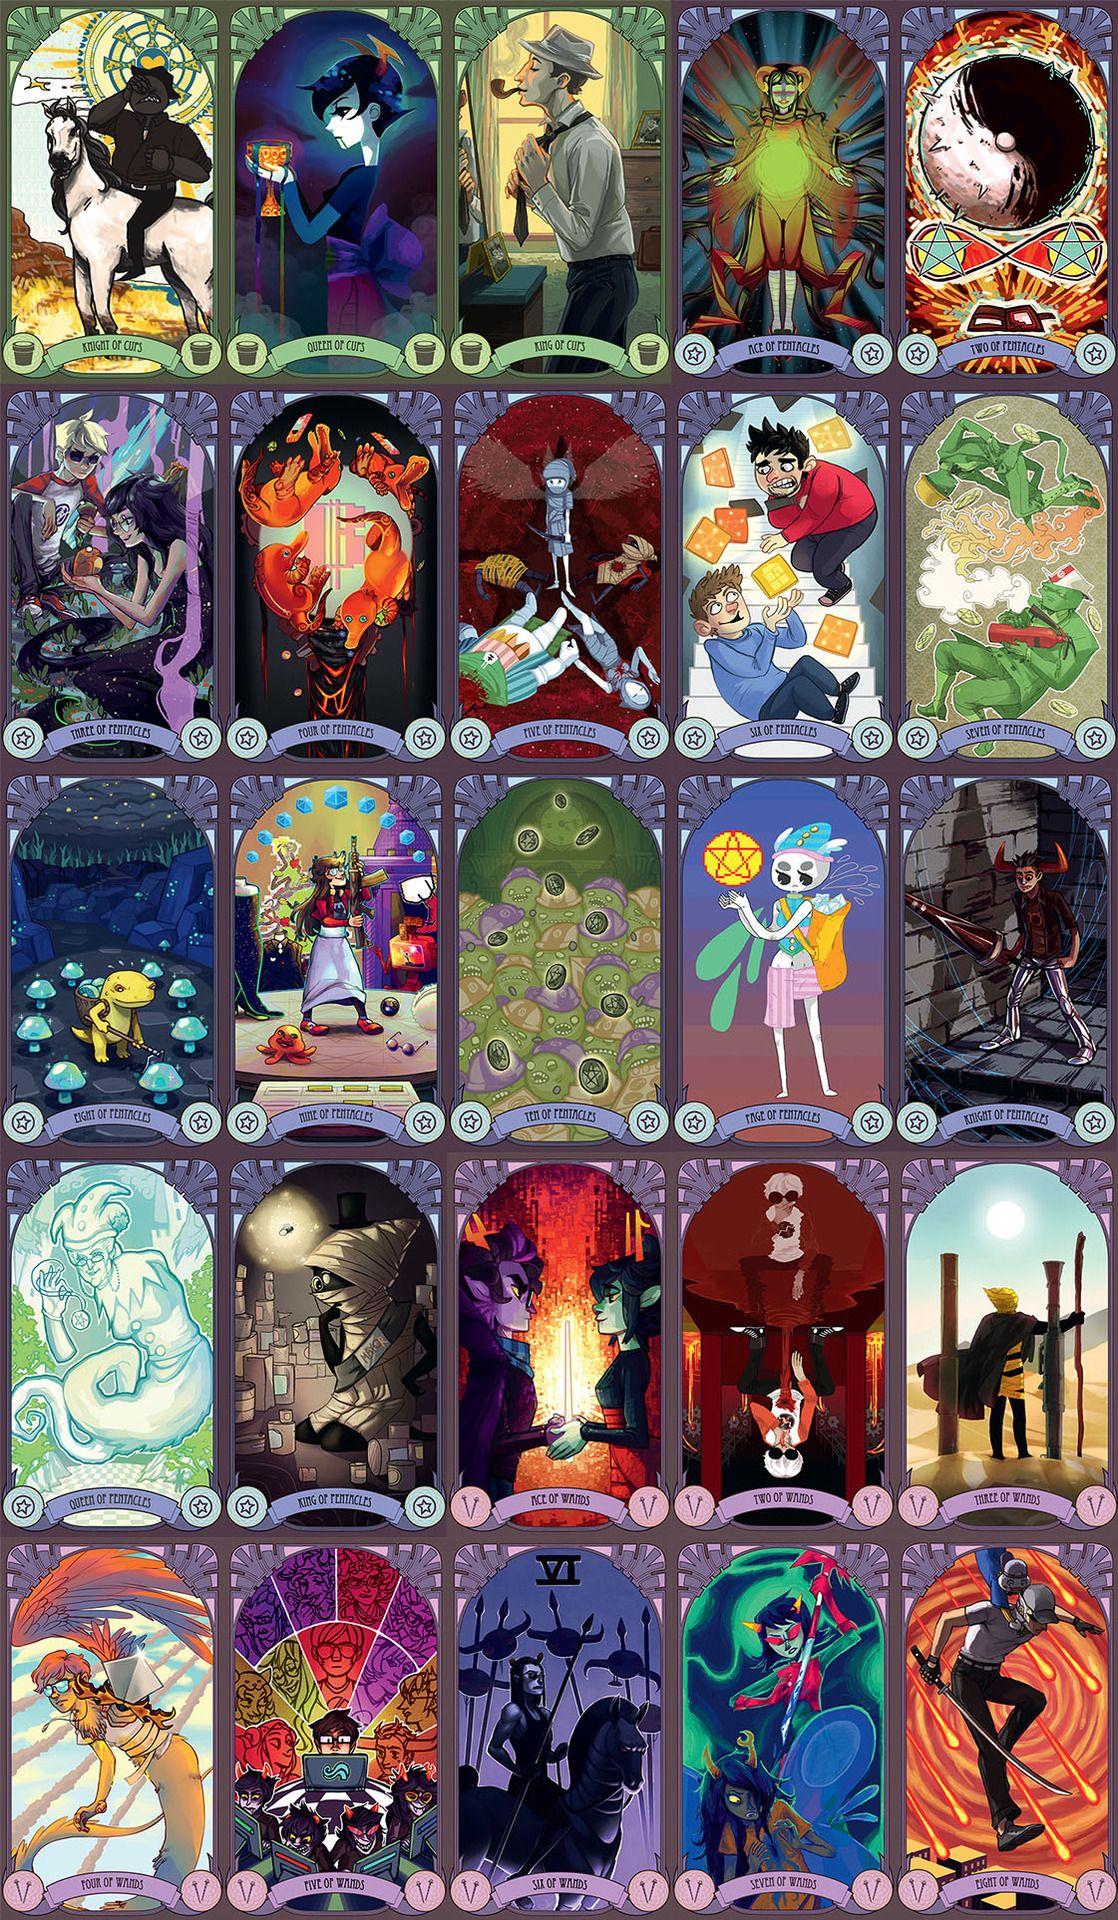 tarot cards major arcana zodiac signs